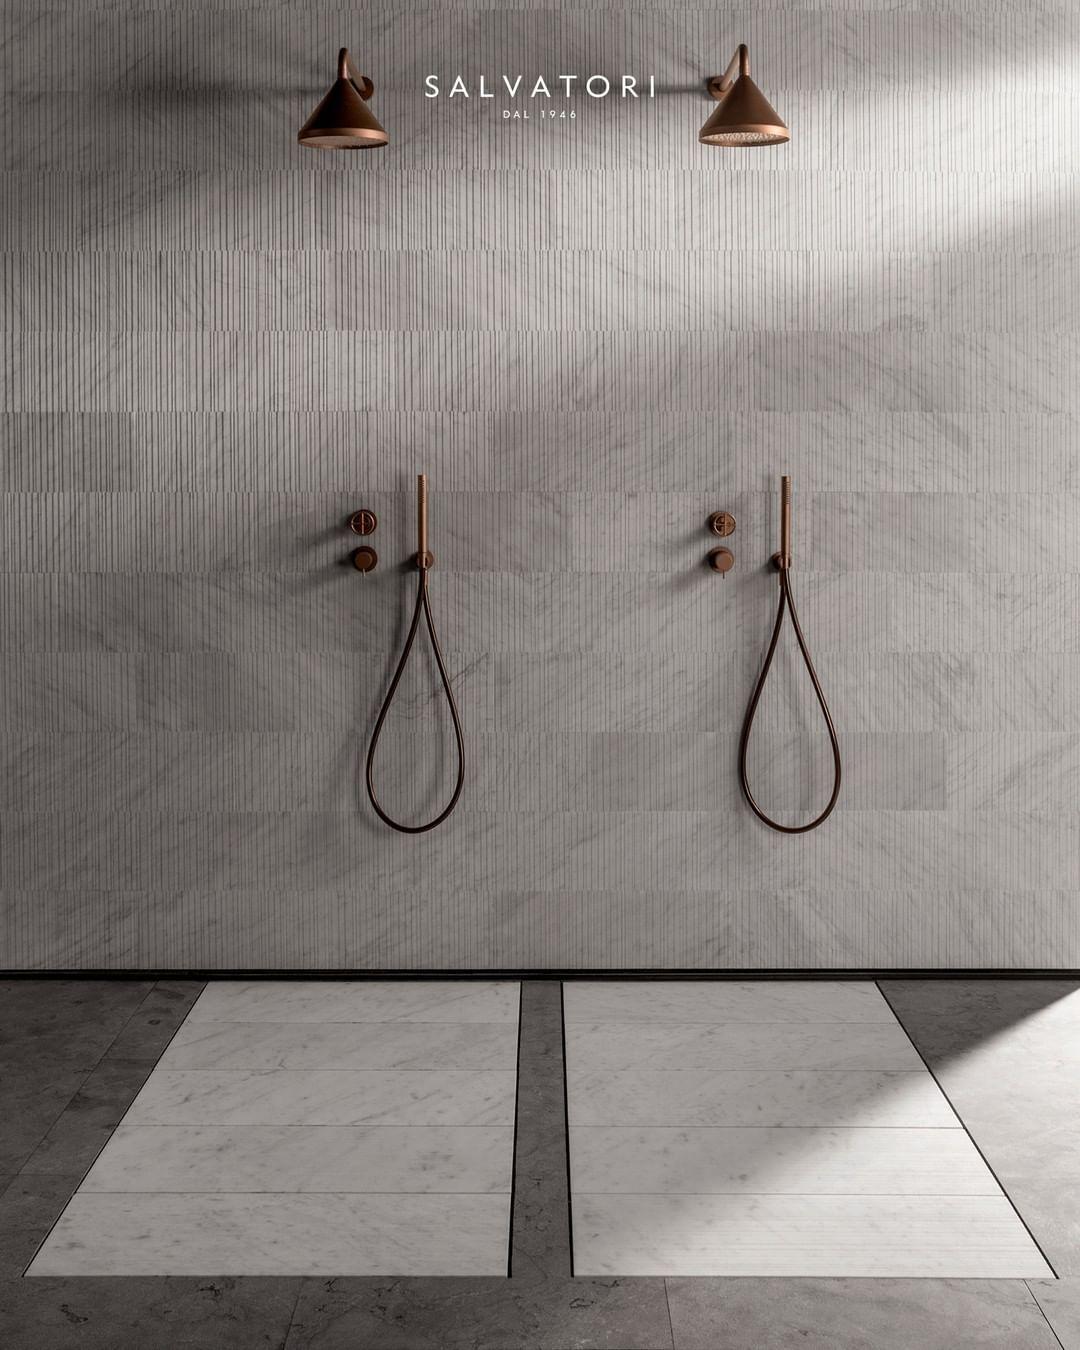 Salvatori Salvatori Official Instagram Photos And Videos In 2020 Bathroom Layout Shower Tray Bathroom